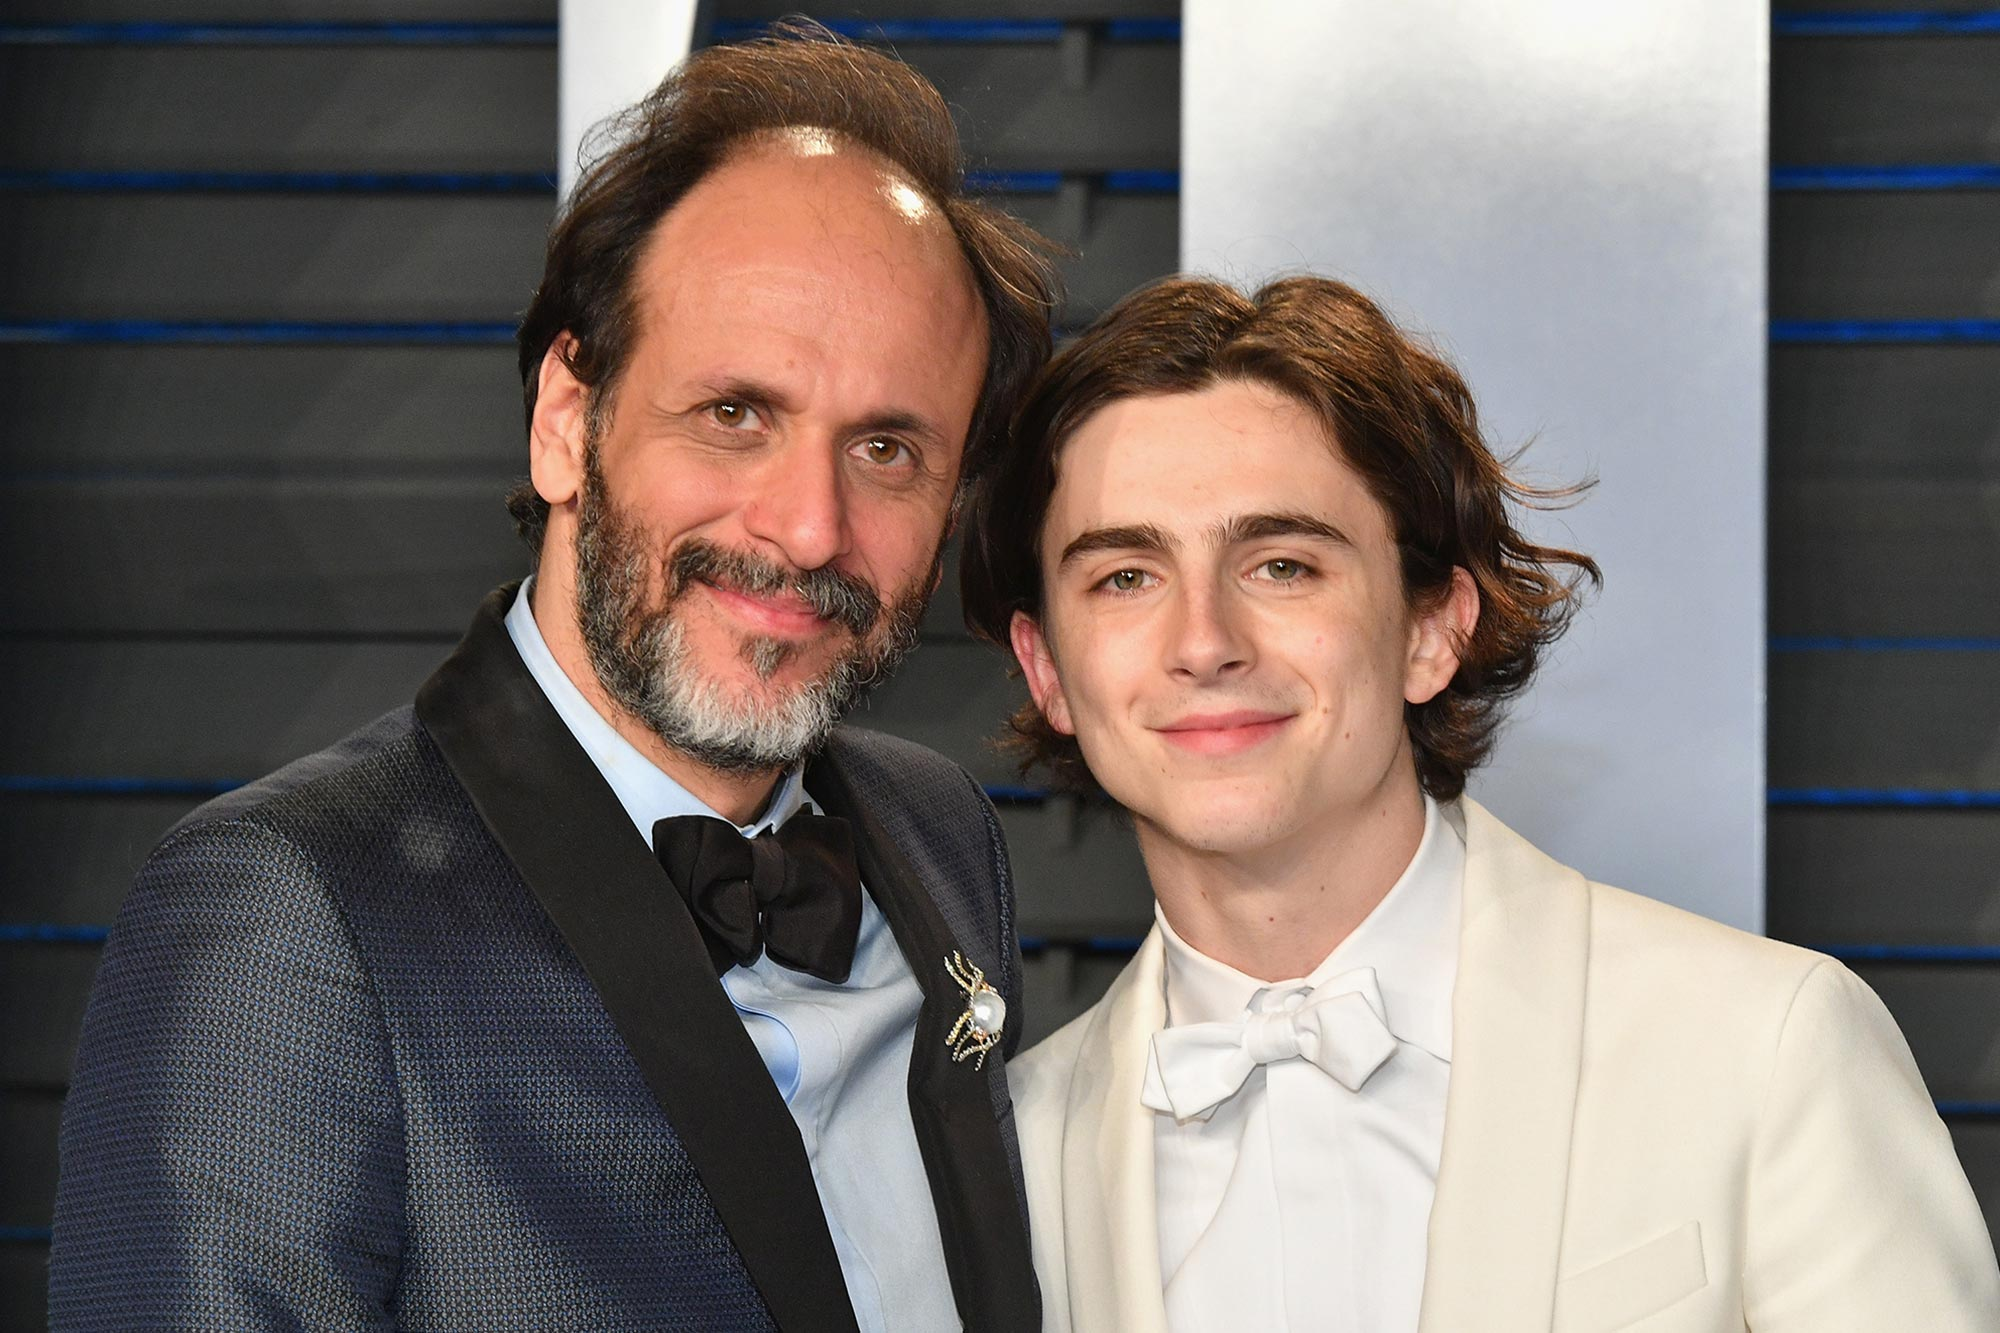 Luca Guadagnino (L) and Timothee Chalamet